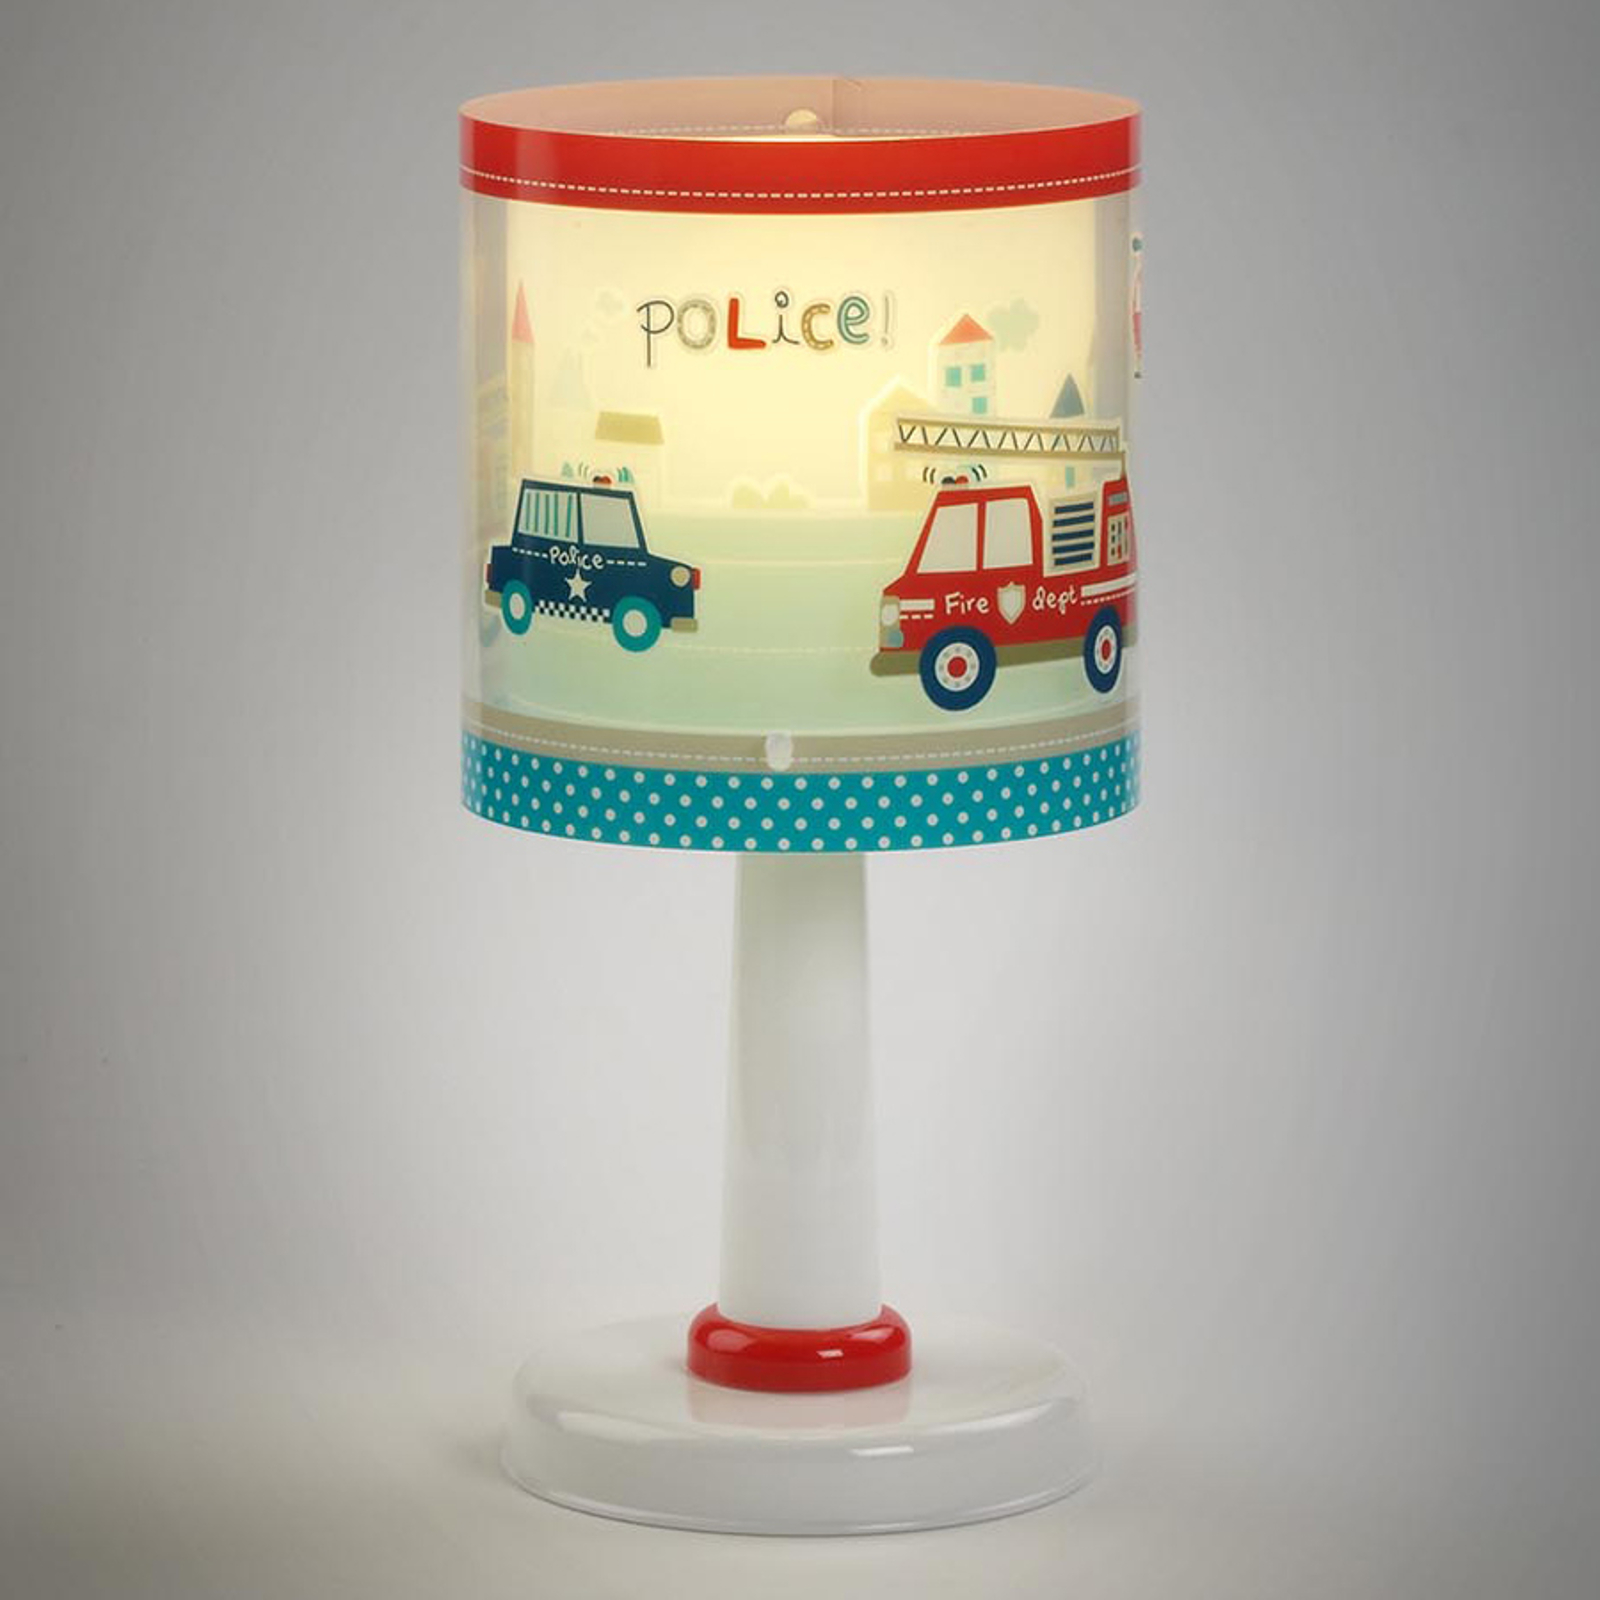 Barnbordslampa Police med motiv